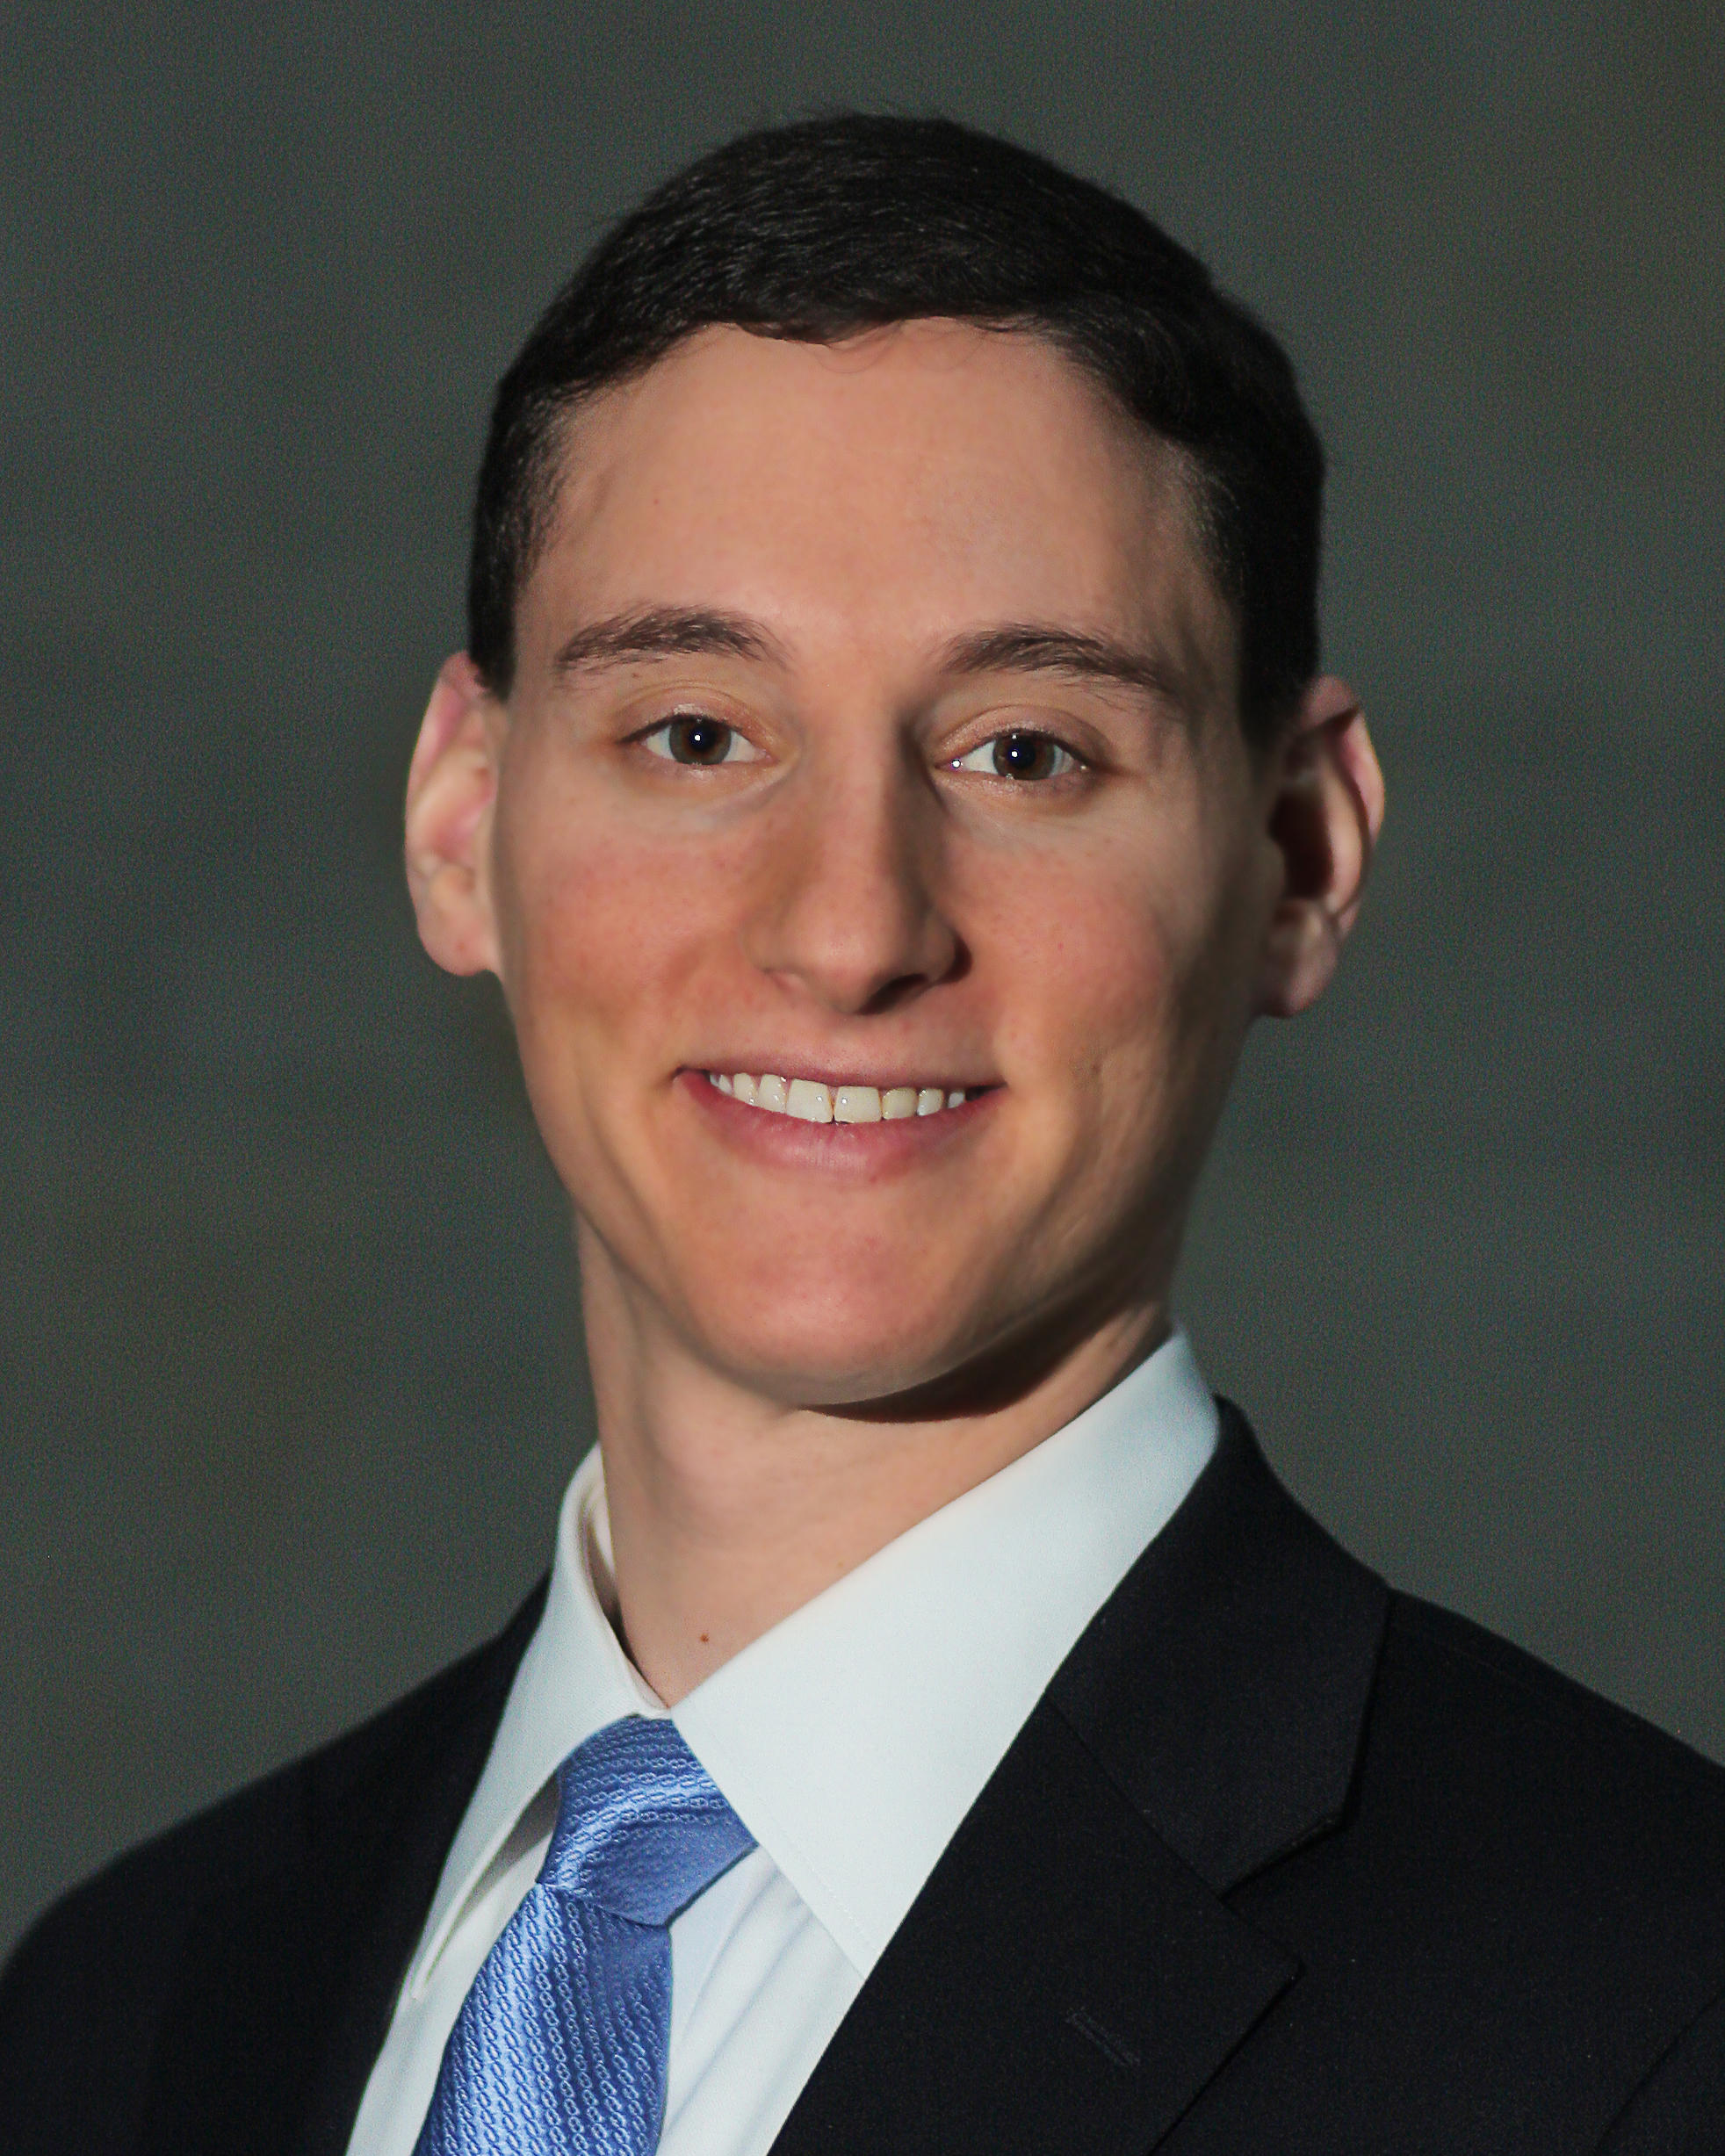 Republican Josh Mandel Re Elected Ohio Treasurer Wyso